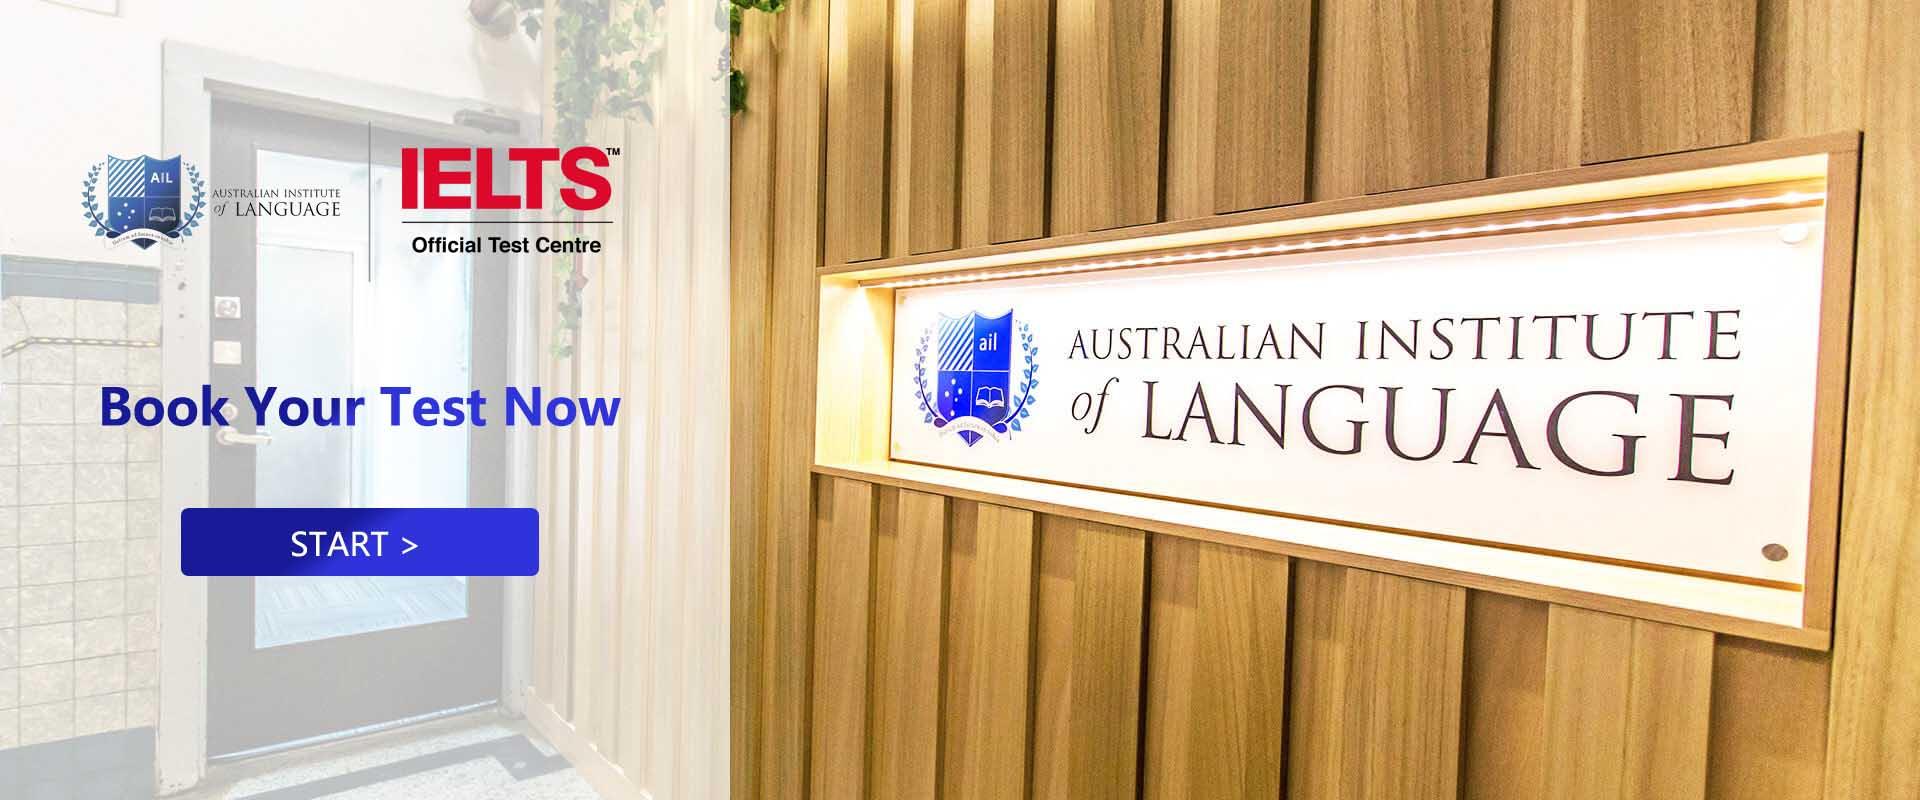 IELTS |AUSTRALIAN INSTITUTE of LANGUAGE | 墨尔本PTE 澳大利亚